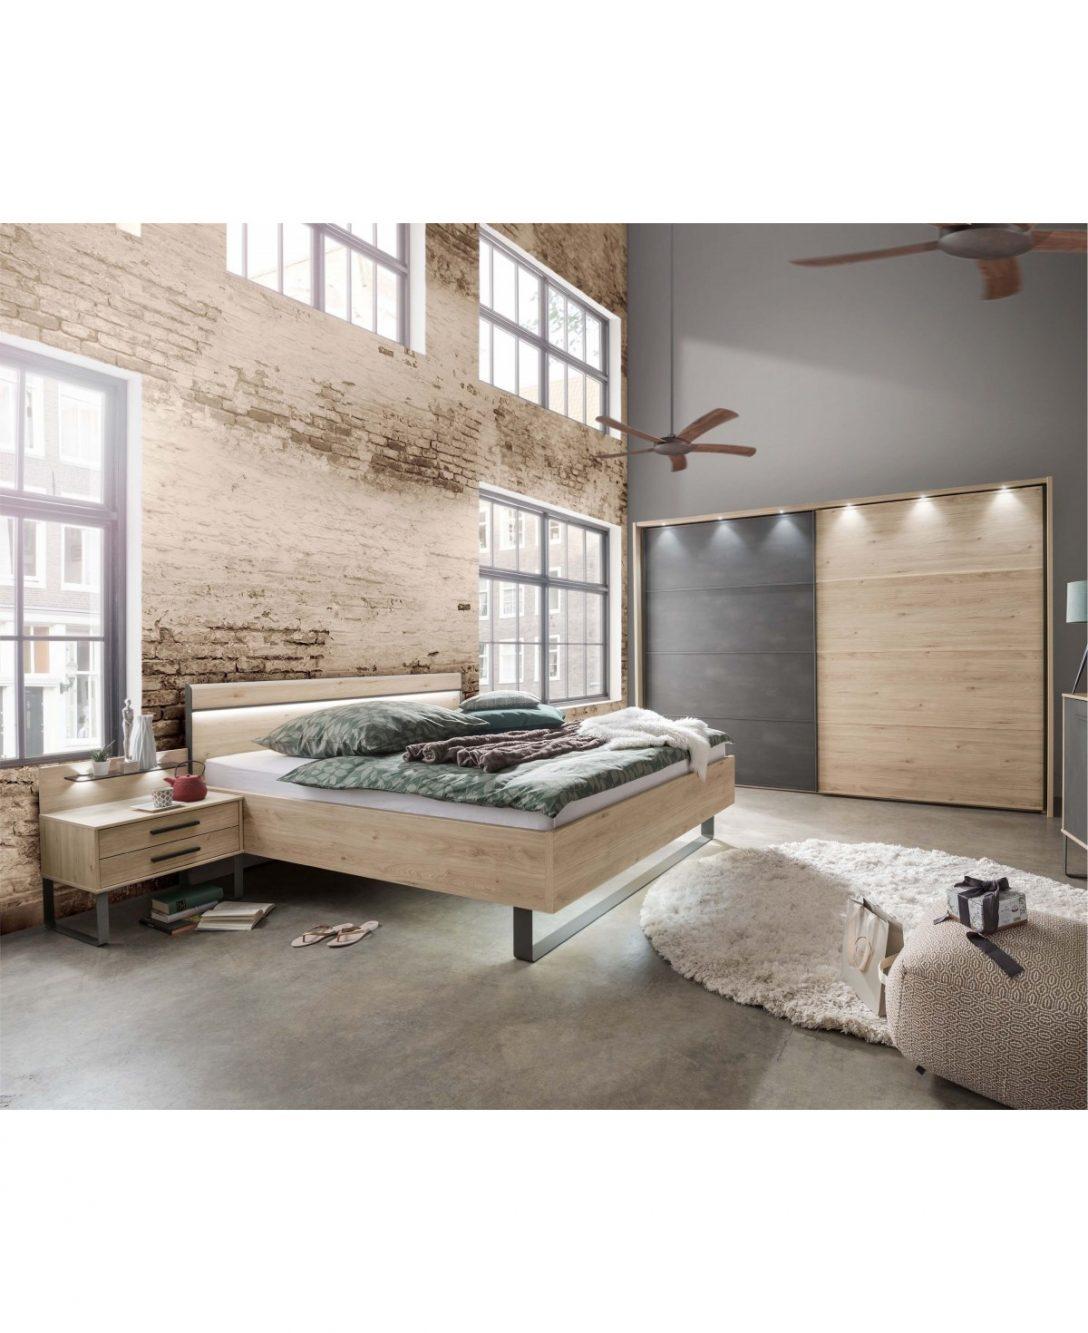 Large Size of Schlafzimmer Betten Wiemann Brssel Schrank Bett Nachttisch 160x200 Kommoden Massivholz Wandlampe Gardinen Für Köln überlänge Outlet Komplett Günstig Mit Schlafzimmer Schlafzimmer Betten